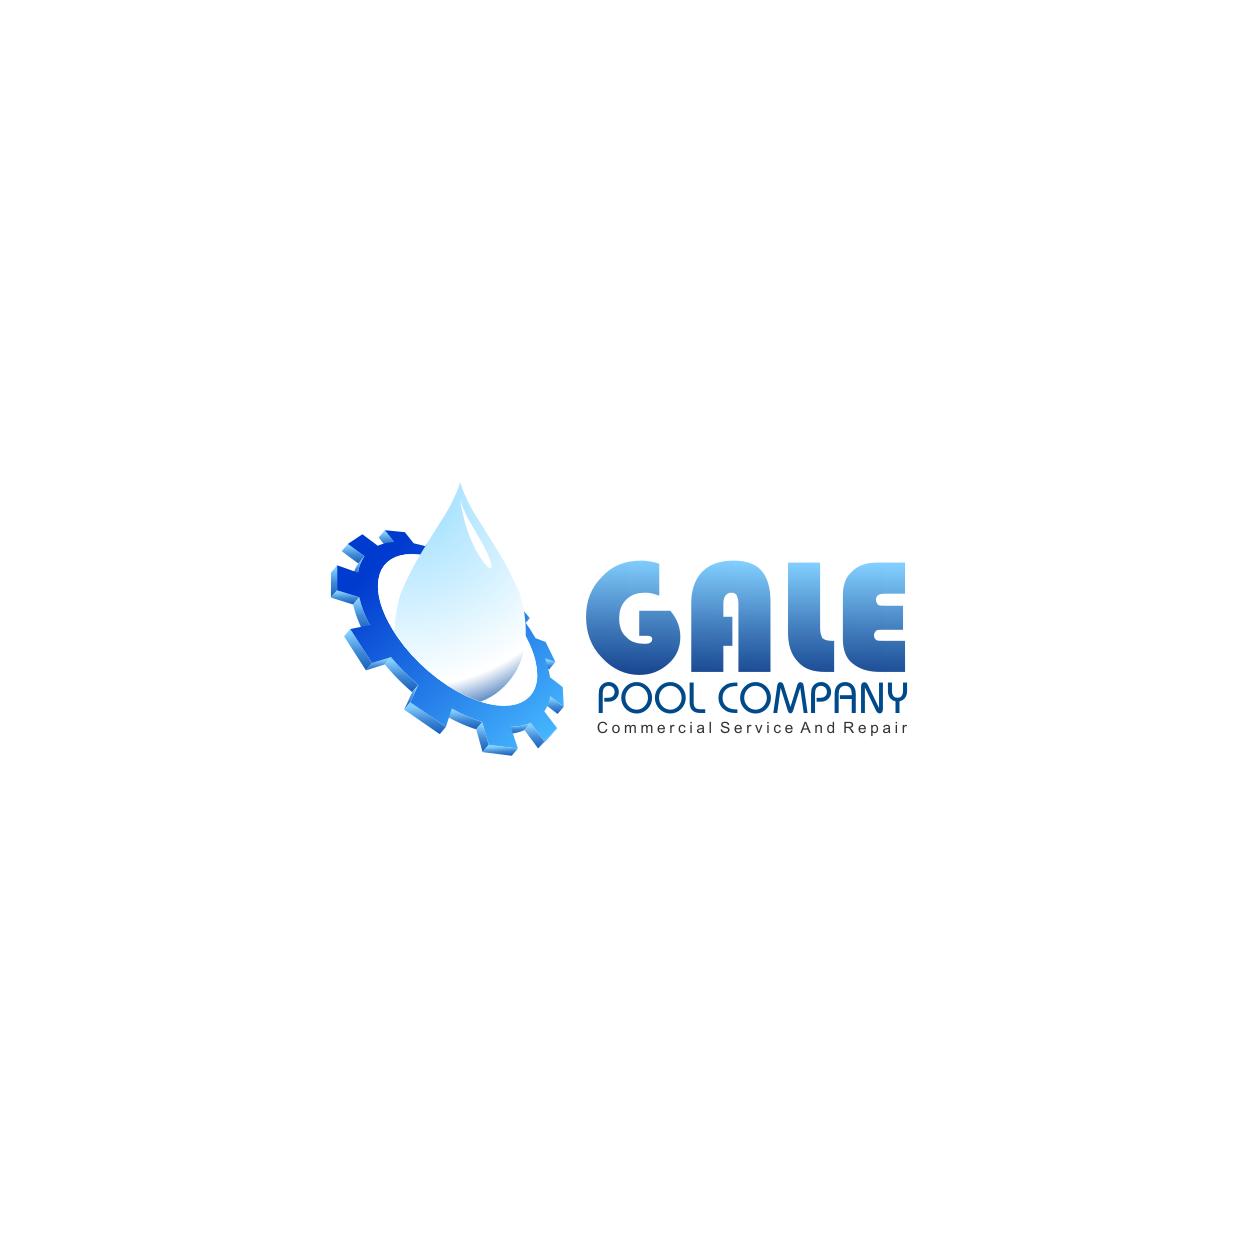 Logo Design by rifatz - Entry No. 105 in the Logo Design Contest Imaginative Logo Design for Gale Pool Company.